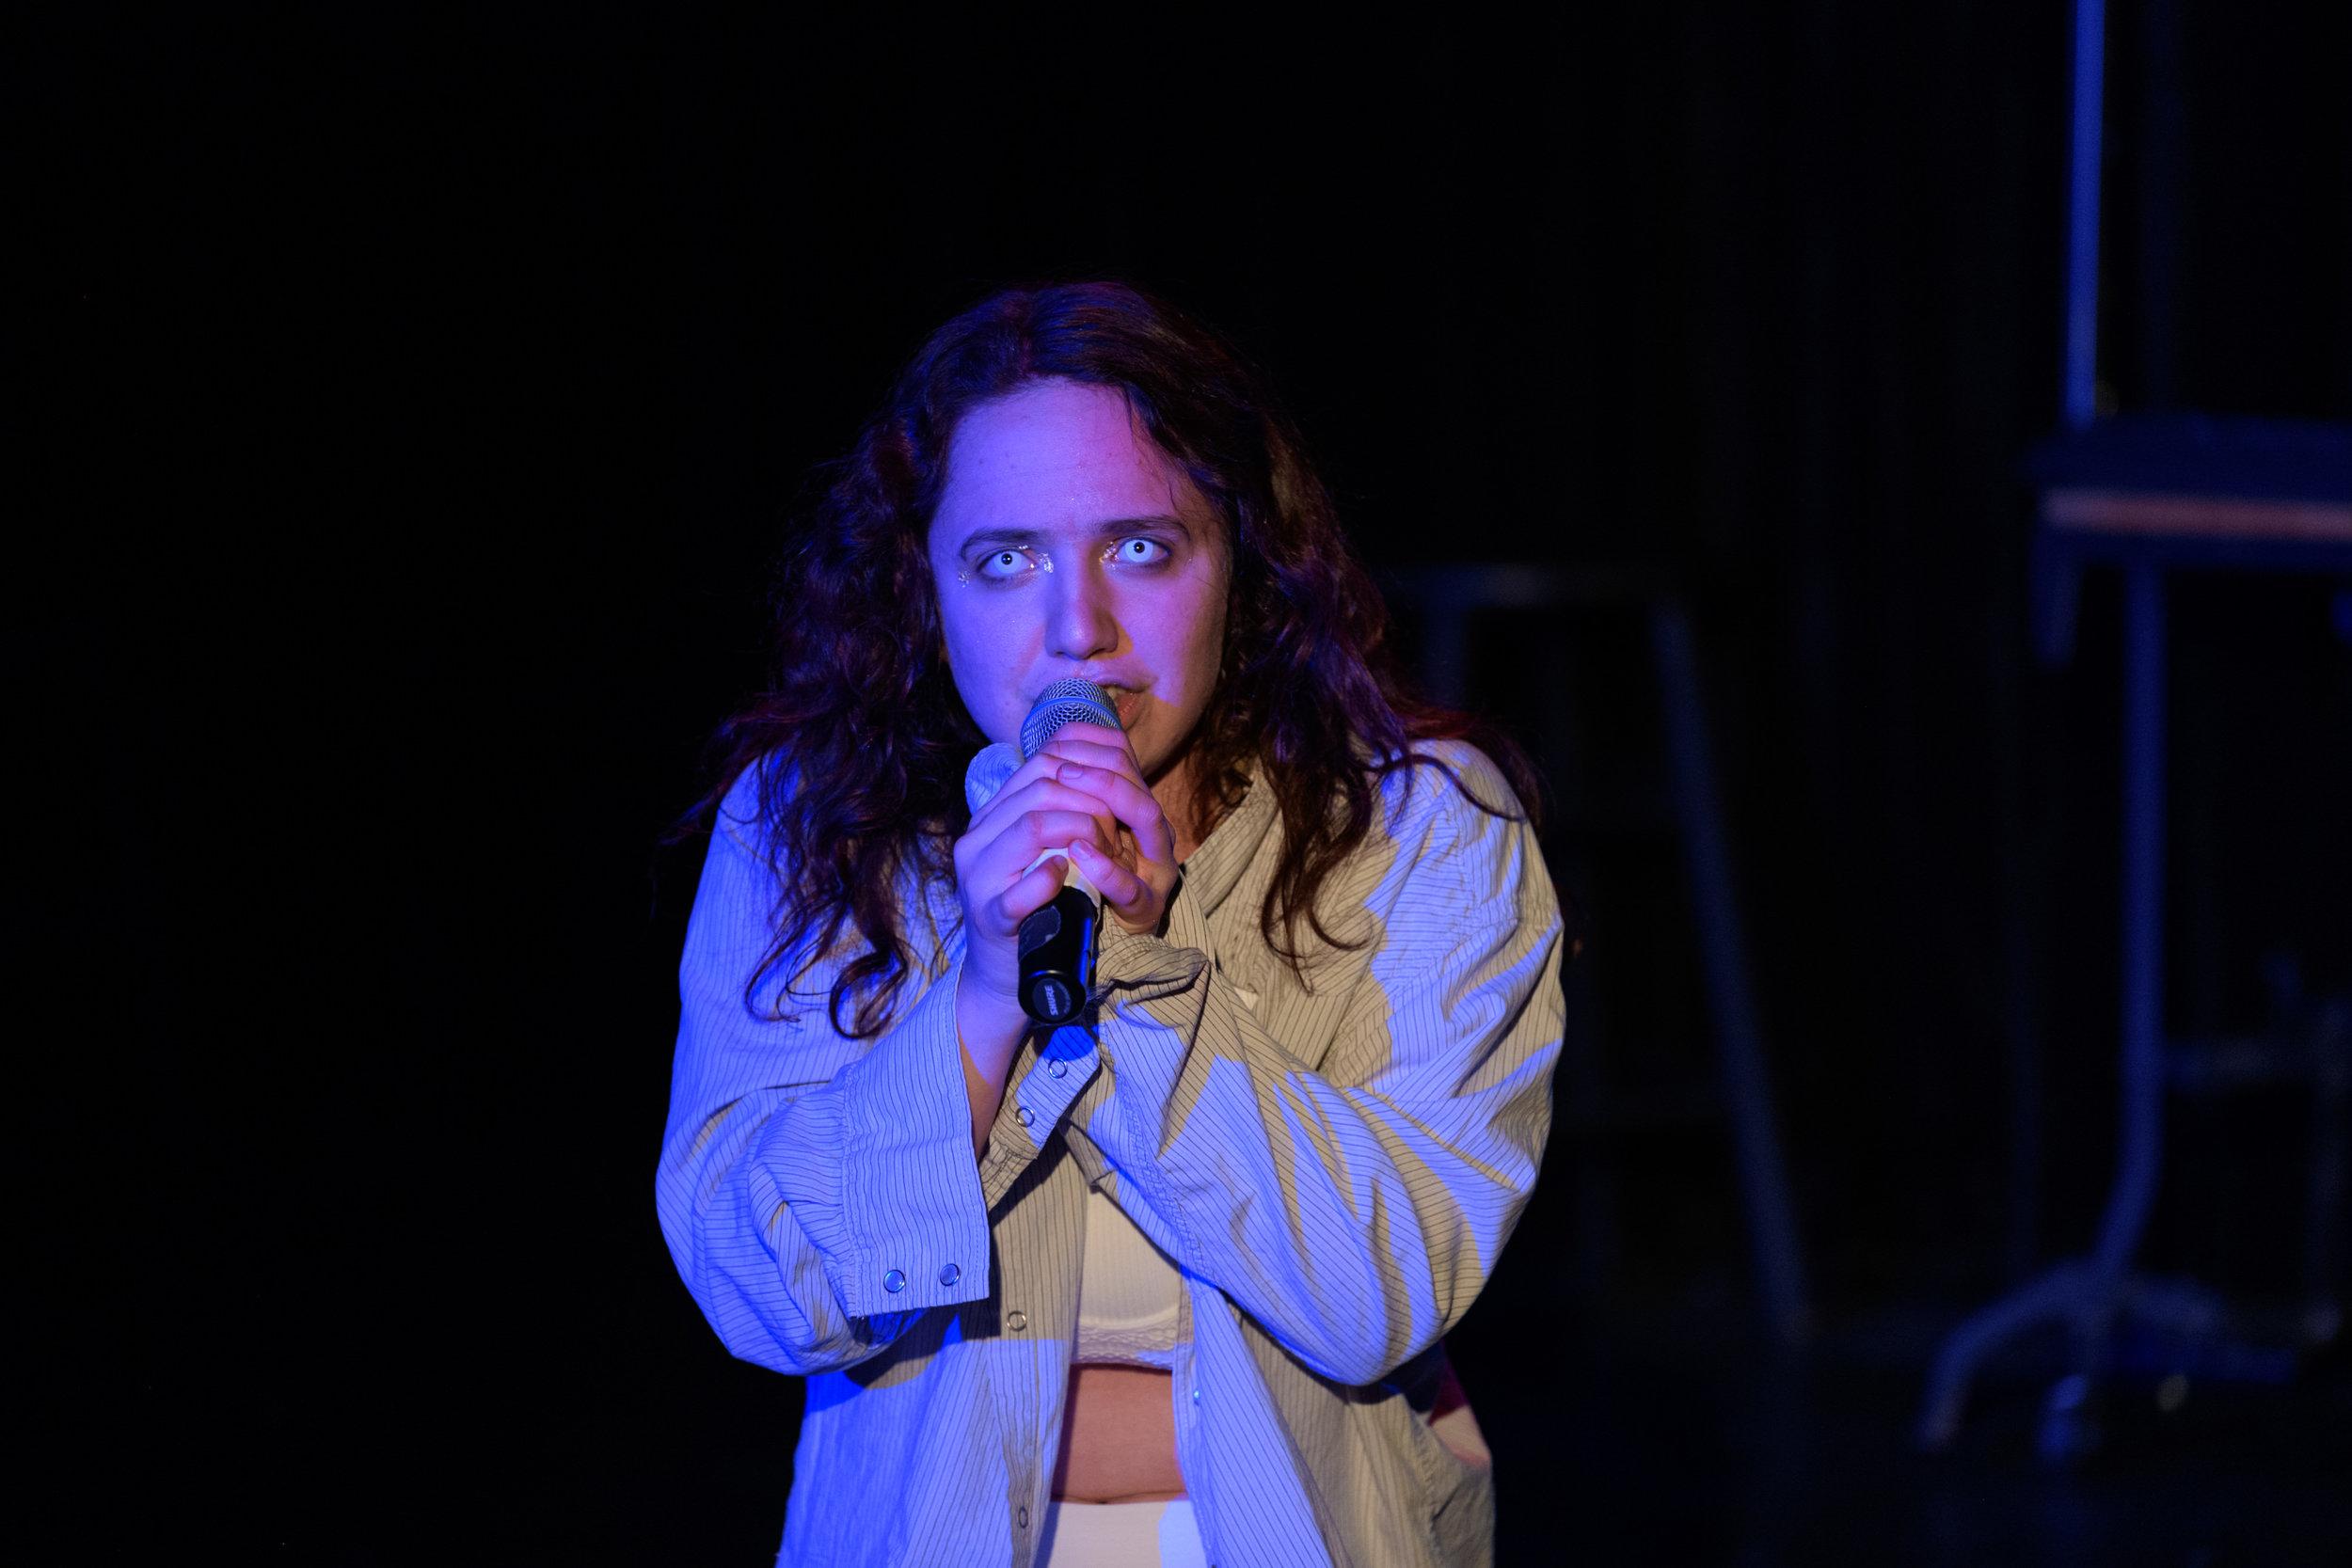 Chloe Falkenheim, as Girl Angel, sings a solo. Note her eyes.